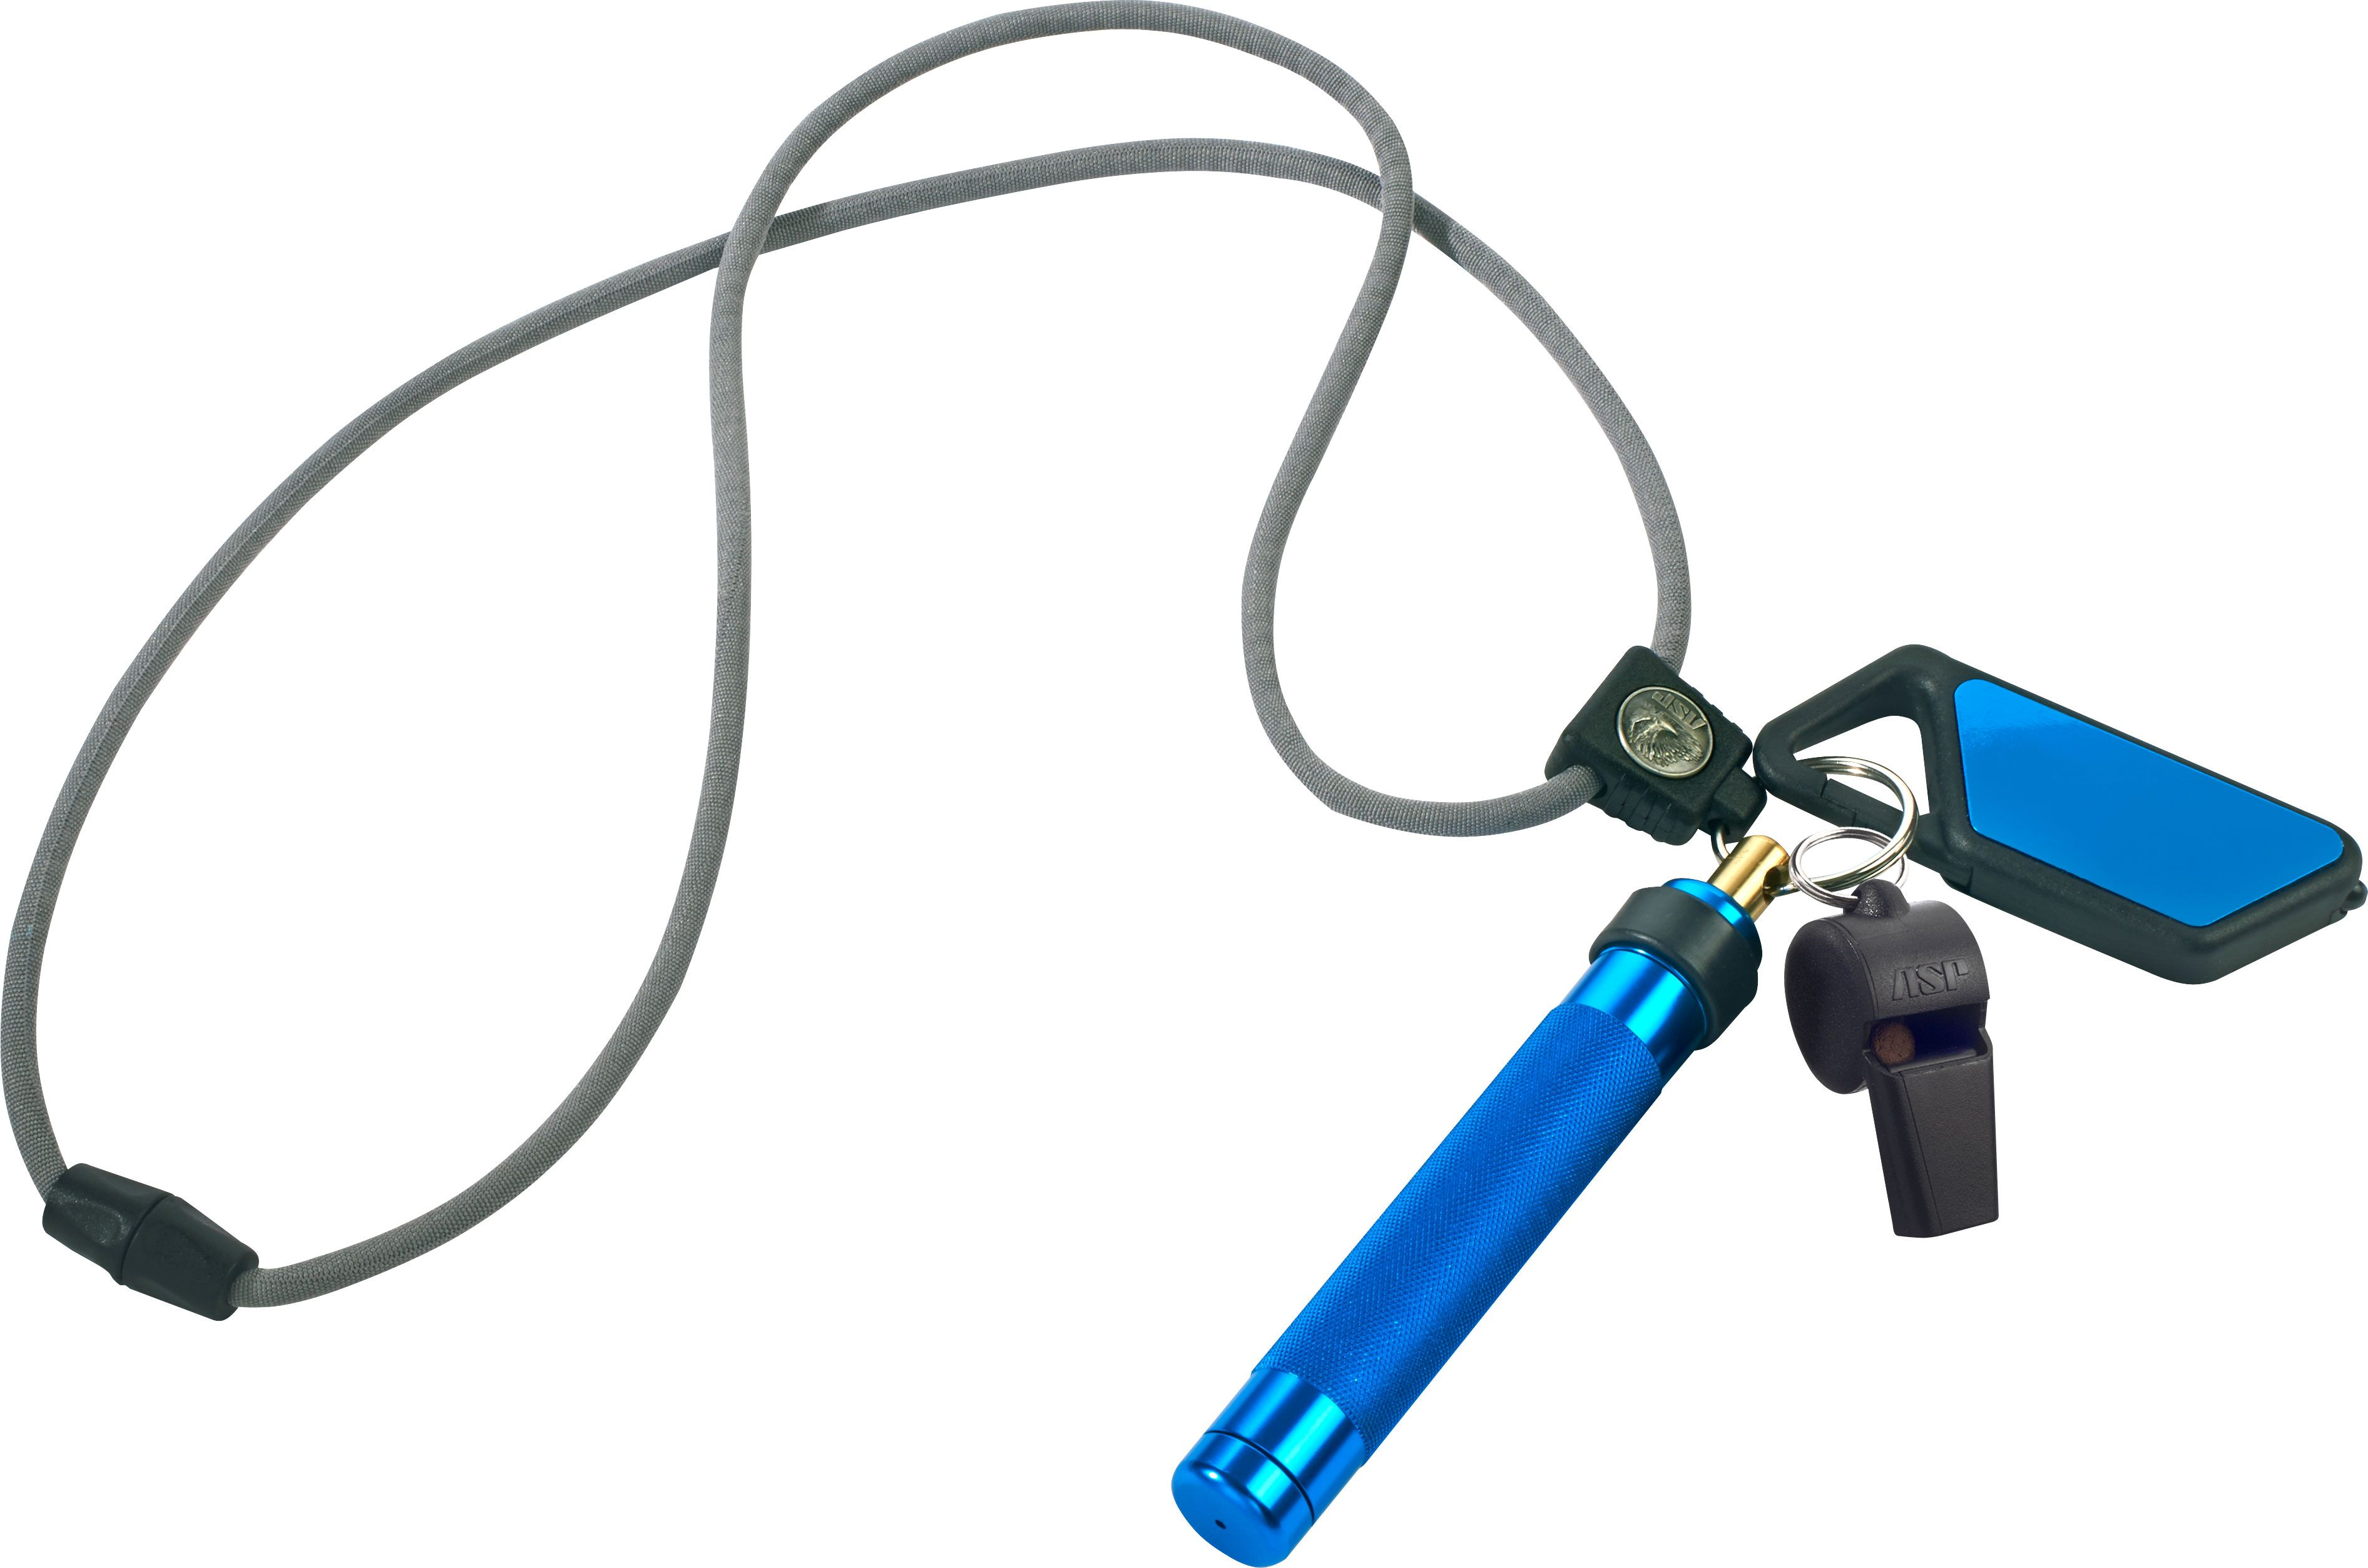 ASP Palm Defender Safety System (Blue) 4 inch Keyring Baton Pepper Spray, Whistle, Sapphire LED Light, Lanyard